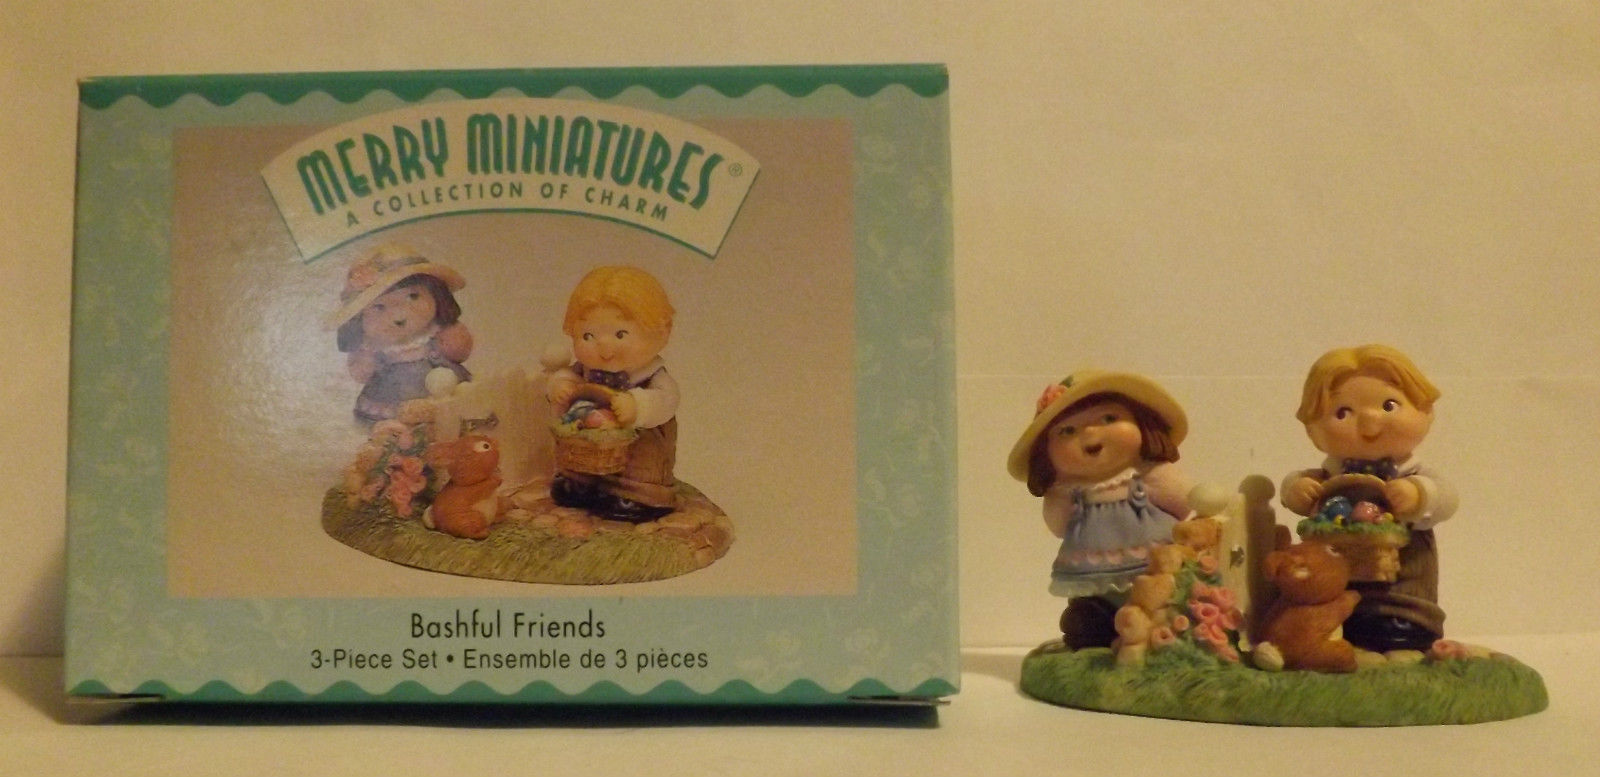 Hallmark Merry Miniatures Bashful Friends 3-Piece Set 1999